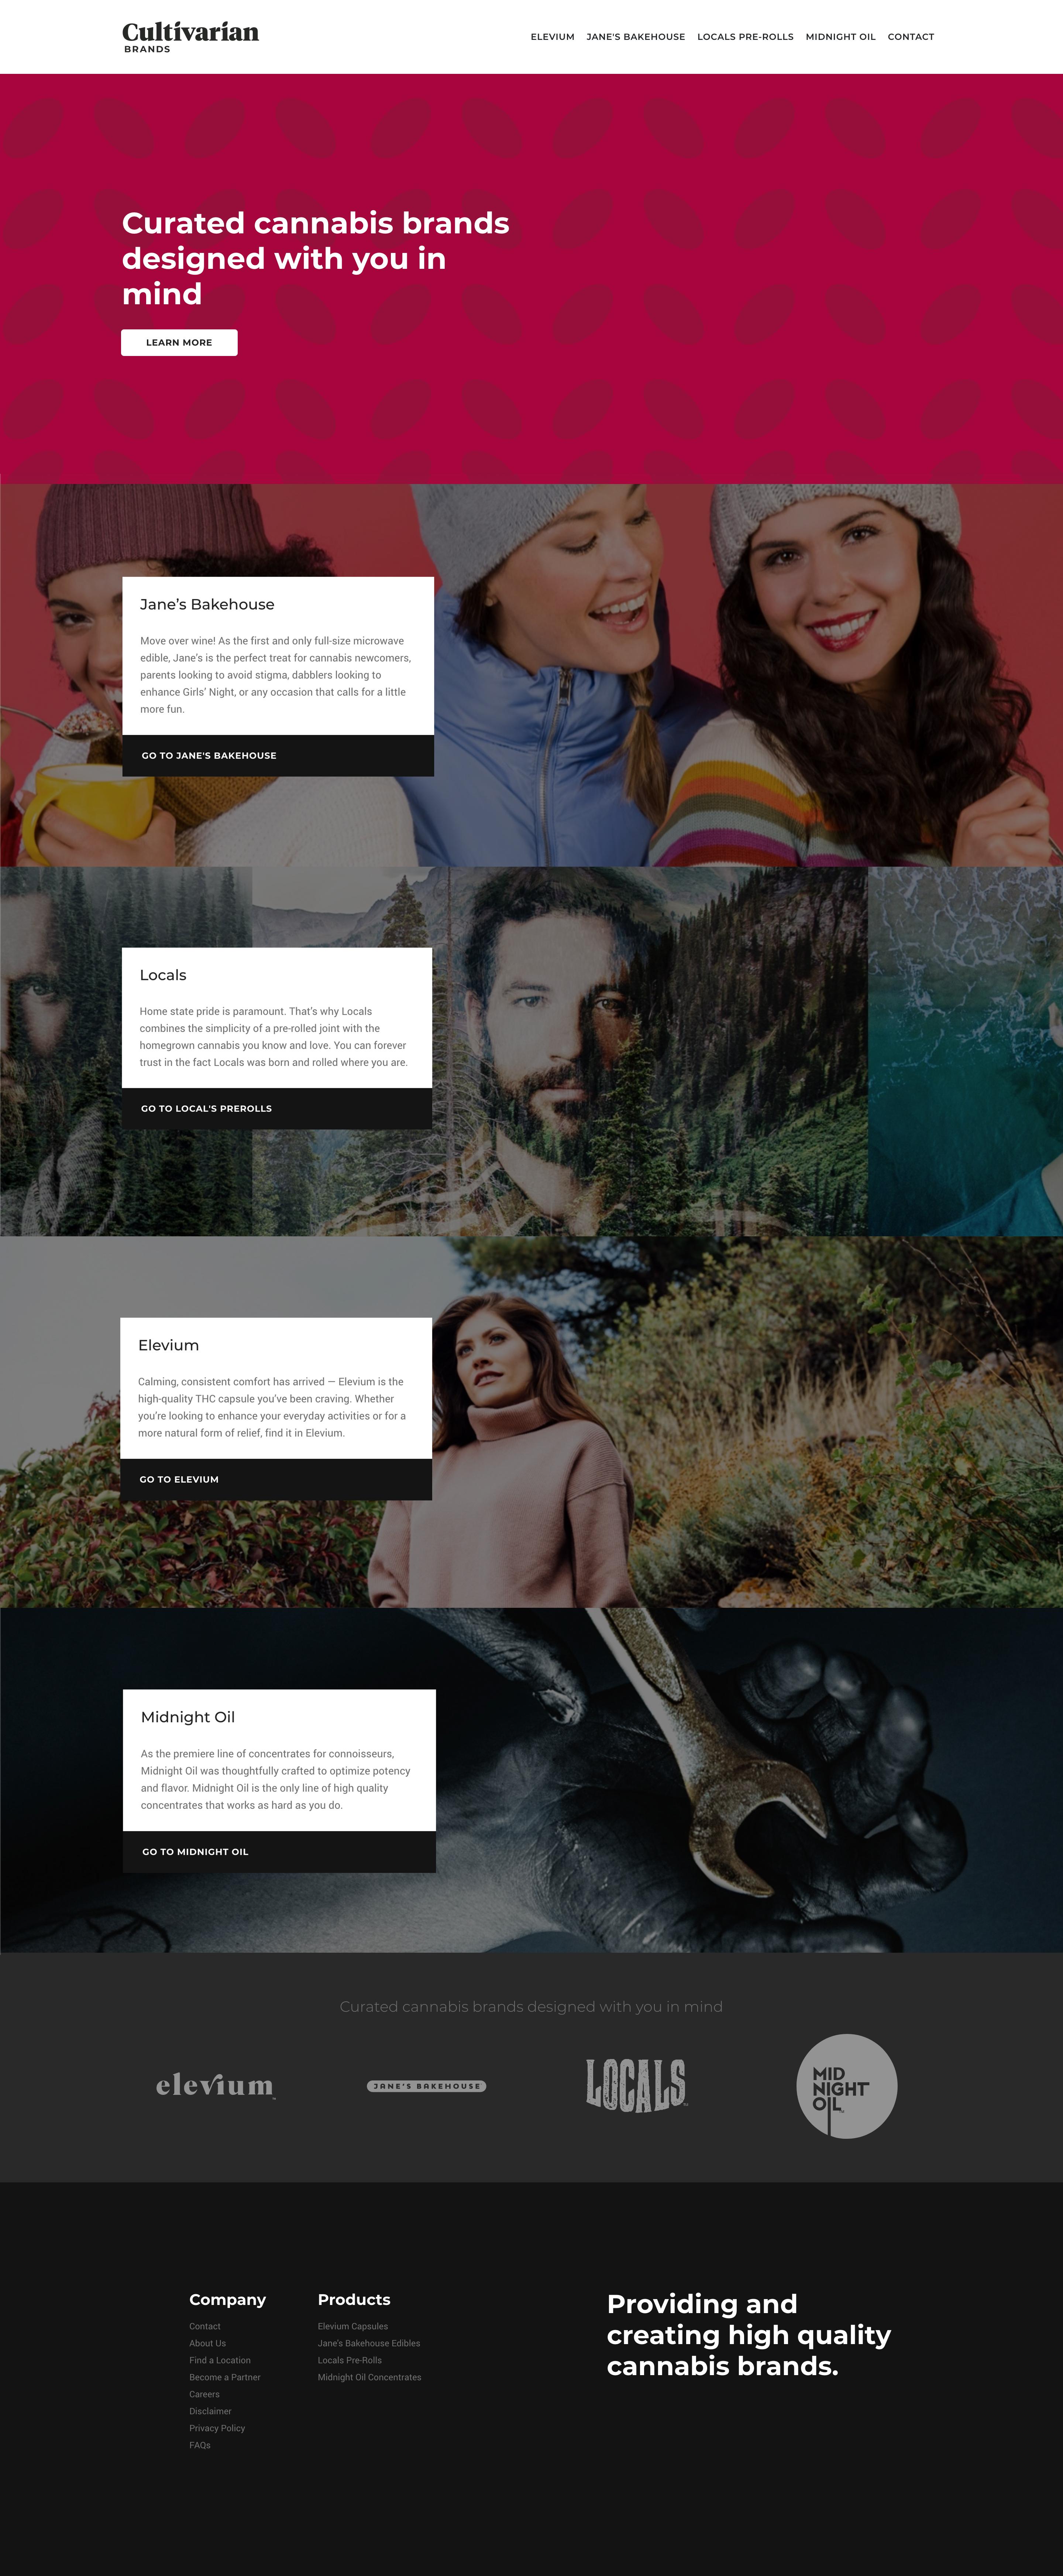 Cultivarian Brands Homepage